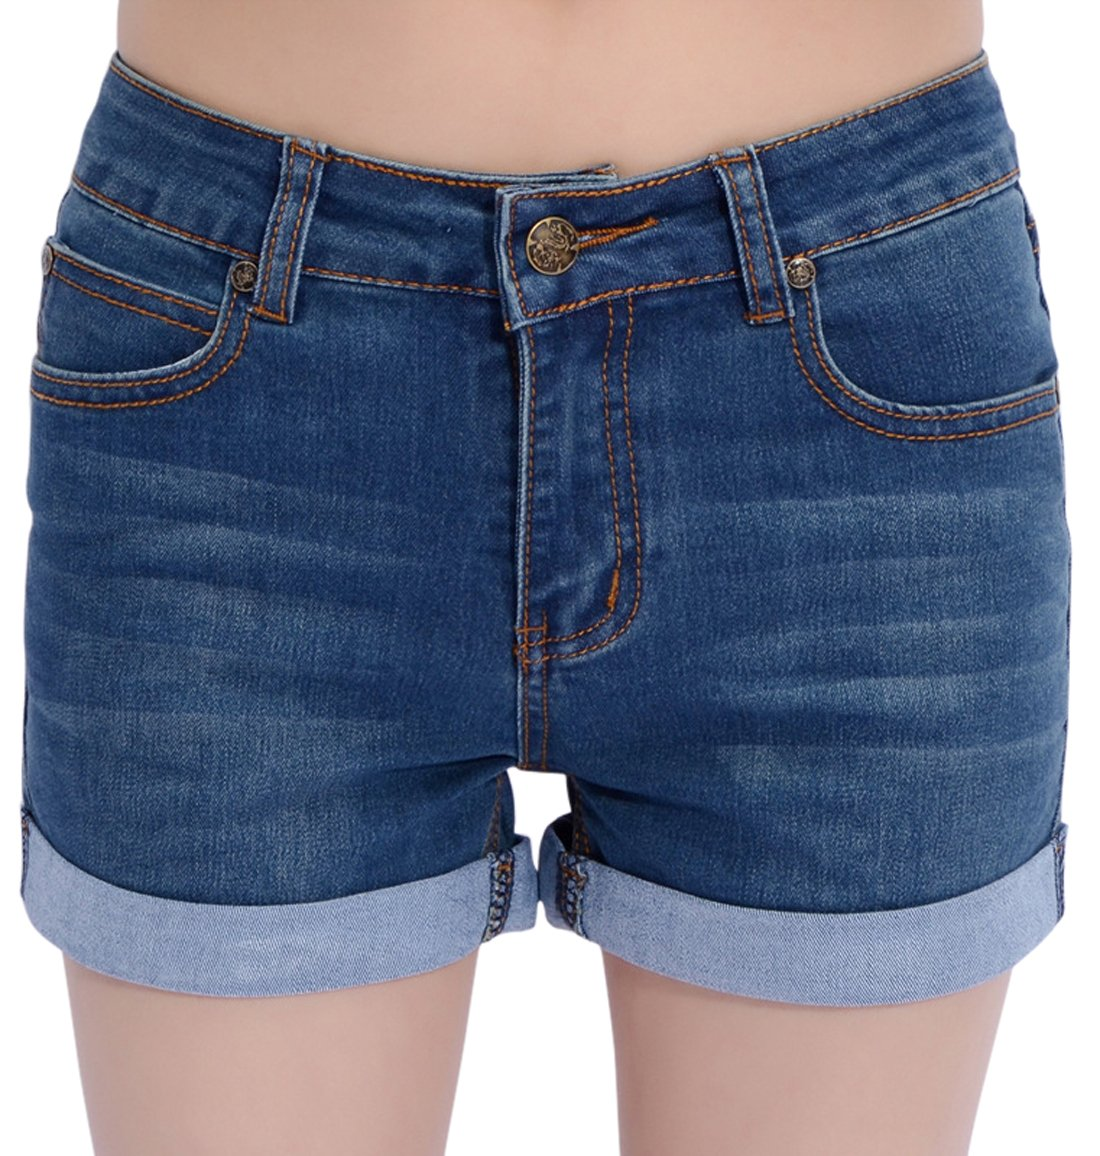 Chouyatou Women's Basic Stretched Mid-Rise Turn-up Cratched Denim Shorts (Large, Blue) by Chouyatou (Image #1)